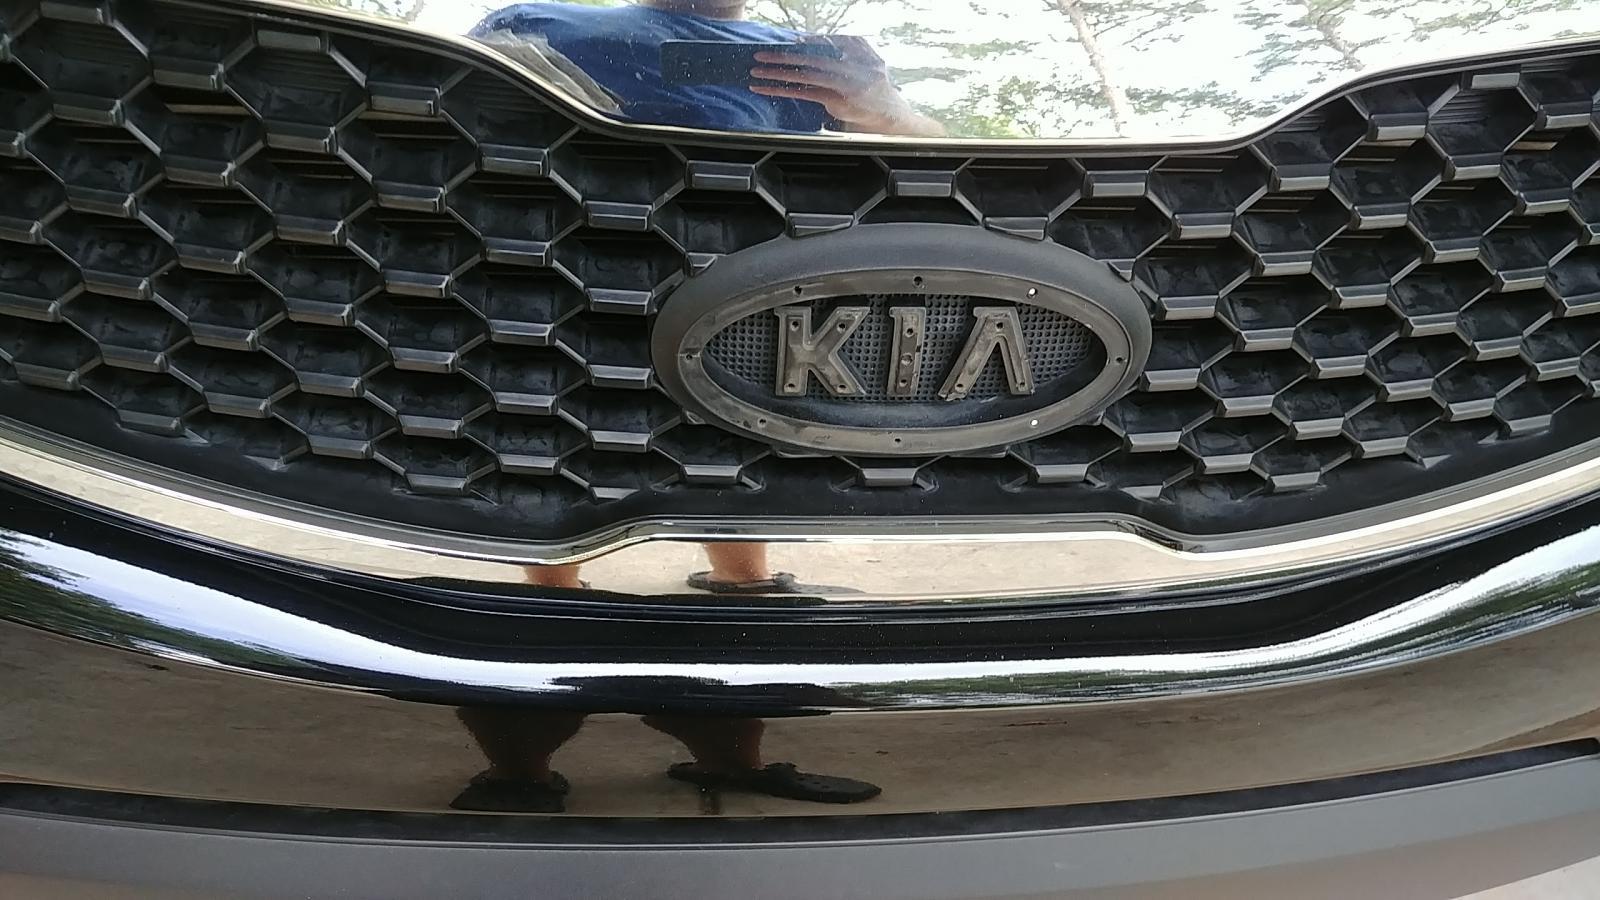 2011 Sorento EX Badge Replacement - Kia Forum